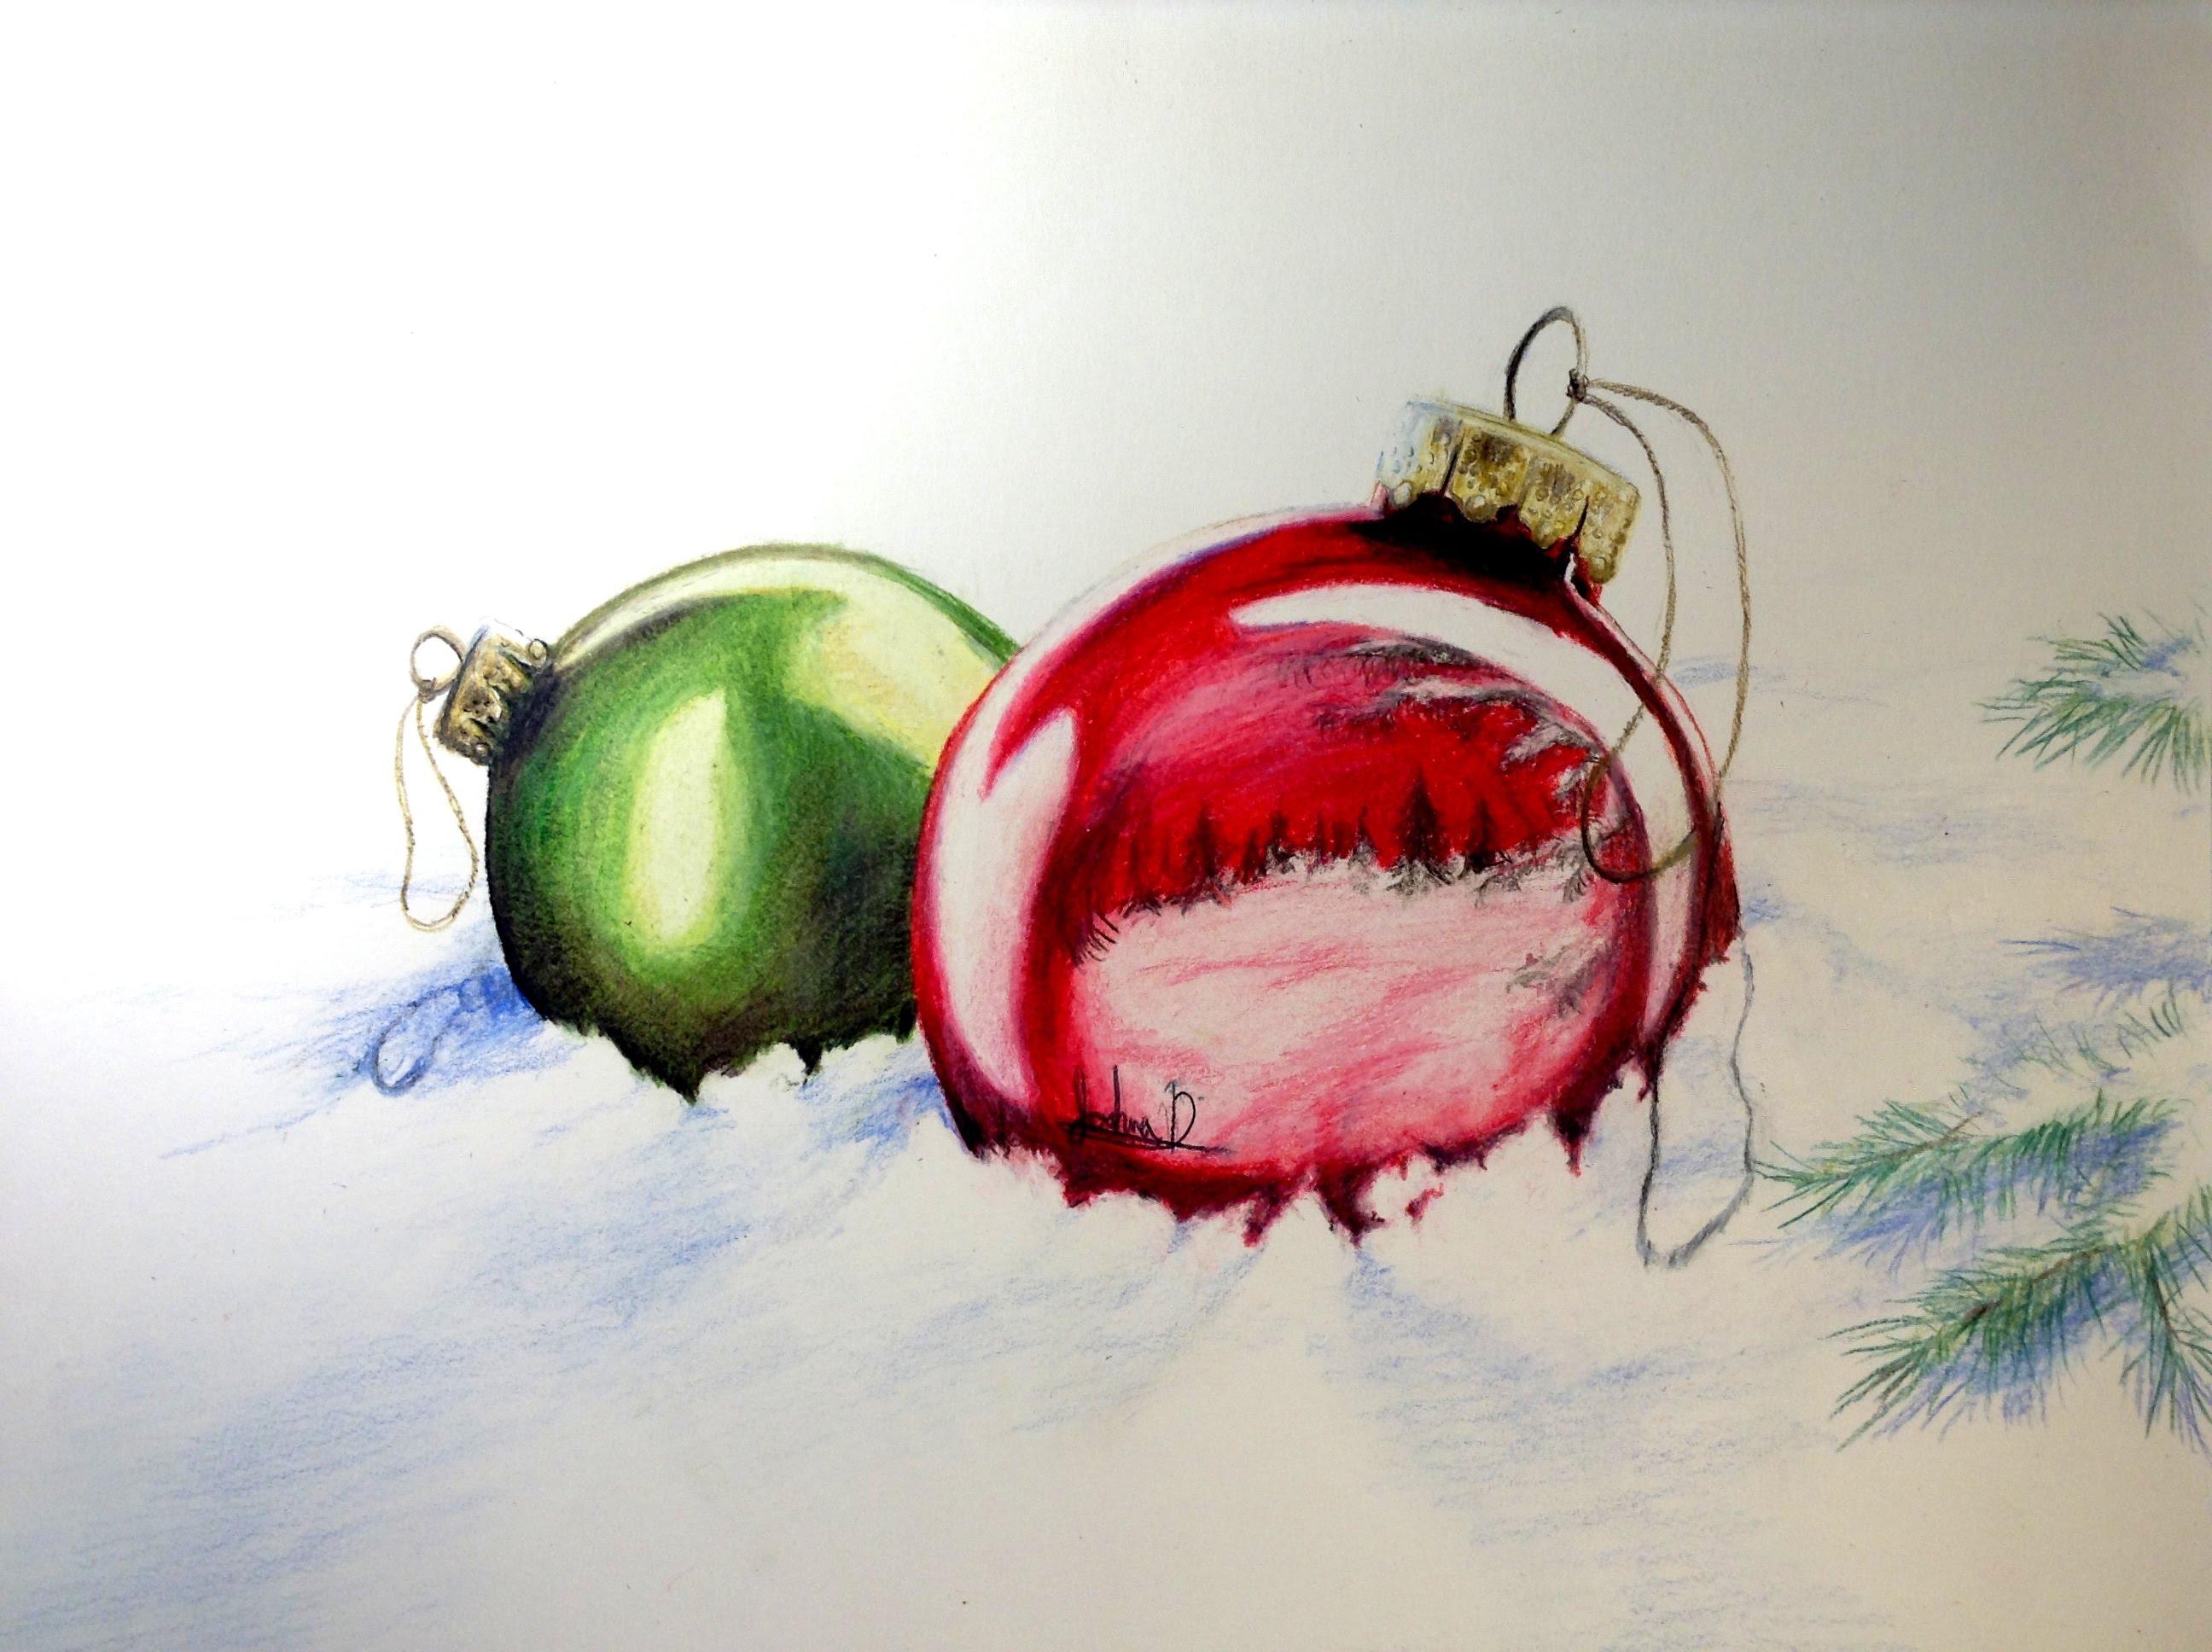 2592x1936 Christmas Ornaments